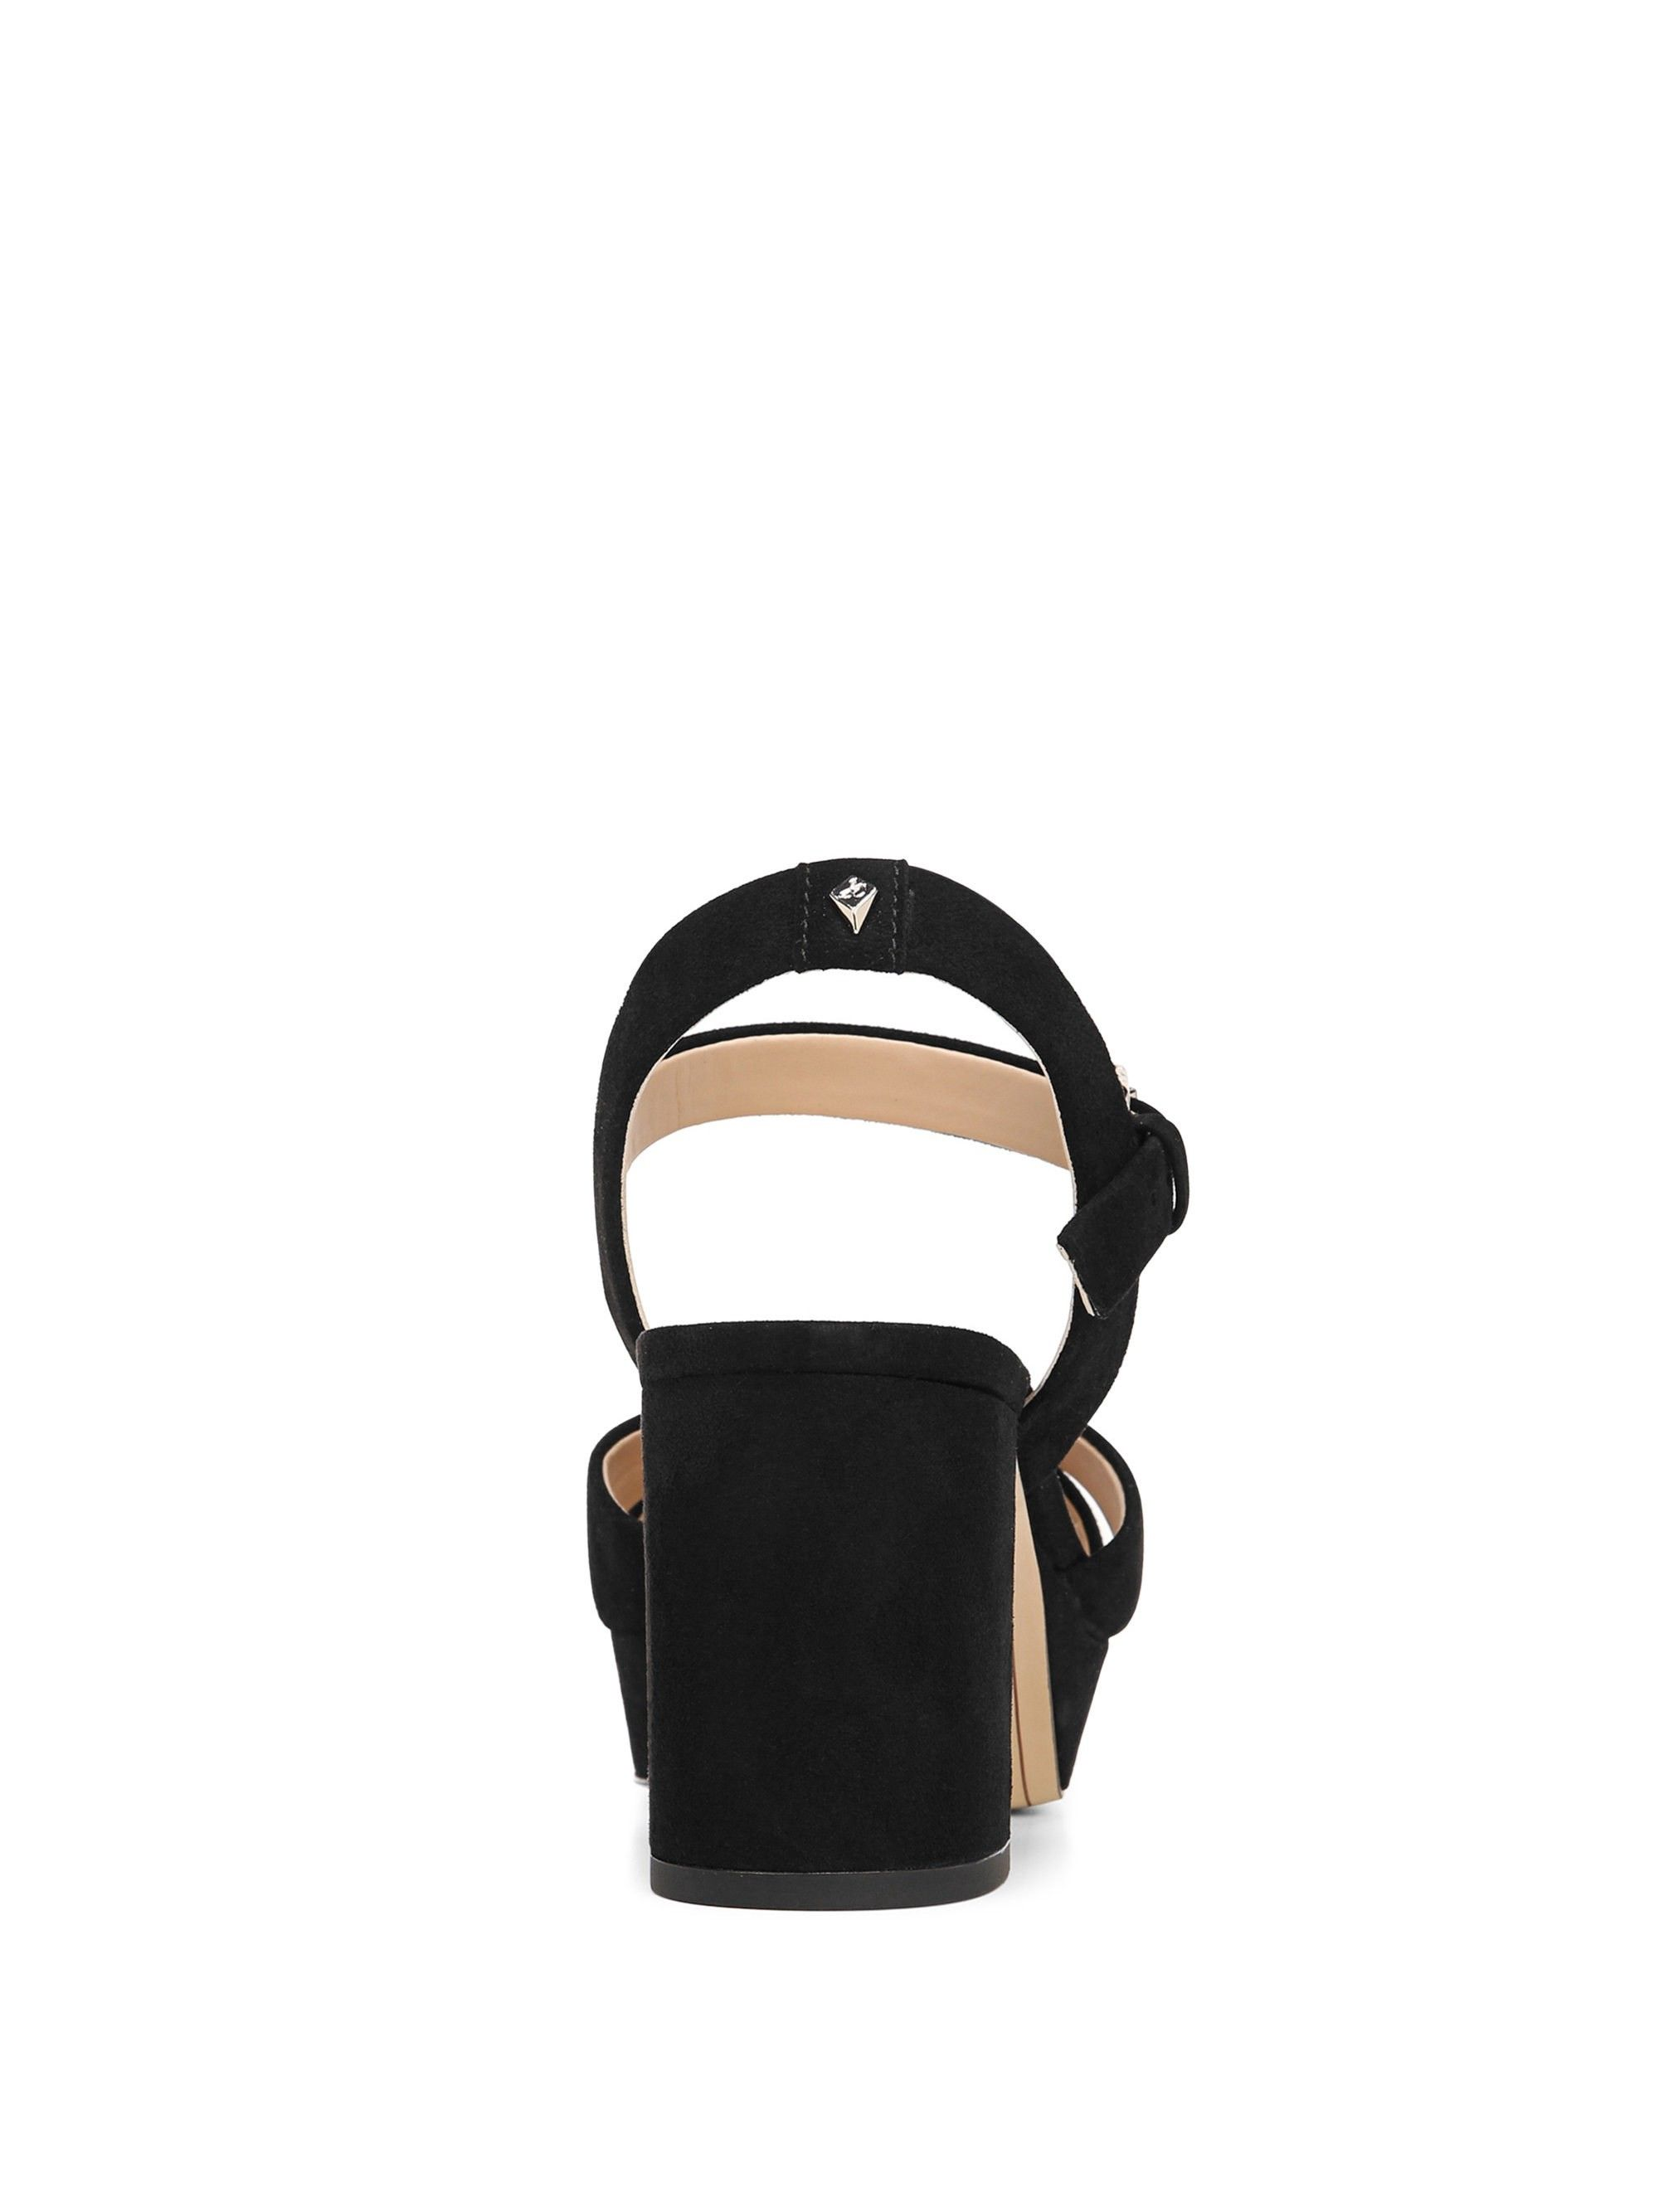 a7edff3c304 Sam Edelman Jolene Suede Platform Ankle-Strap Sandals - Black 6.5